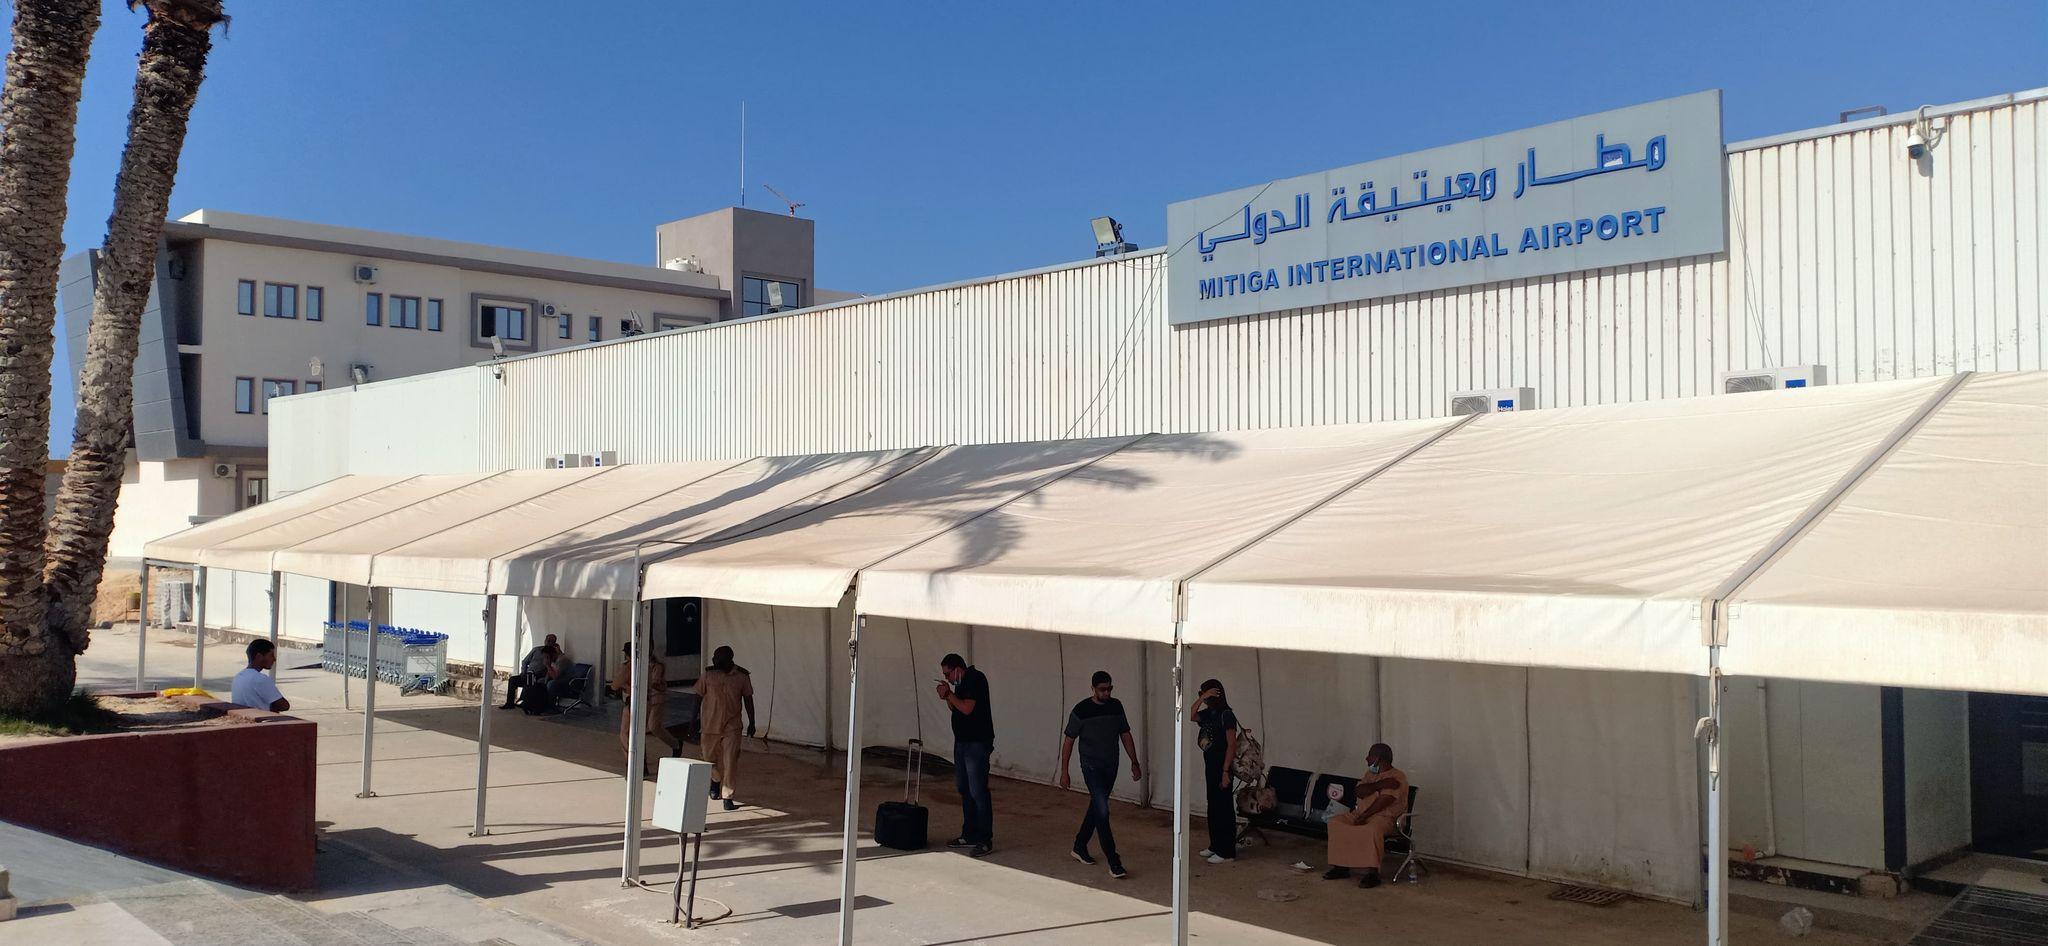 libya-airport-mitiga